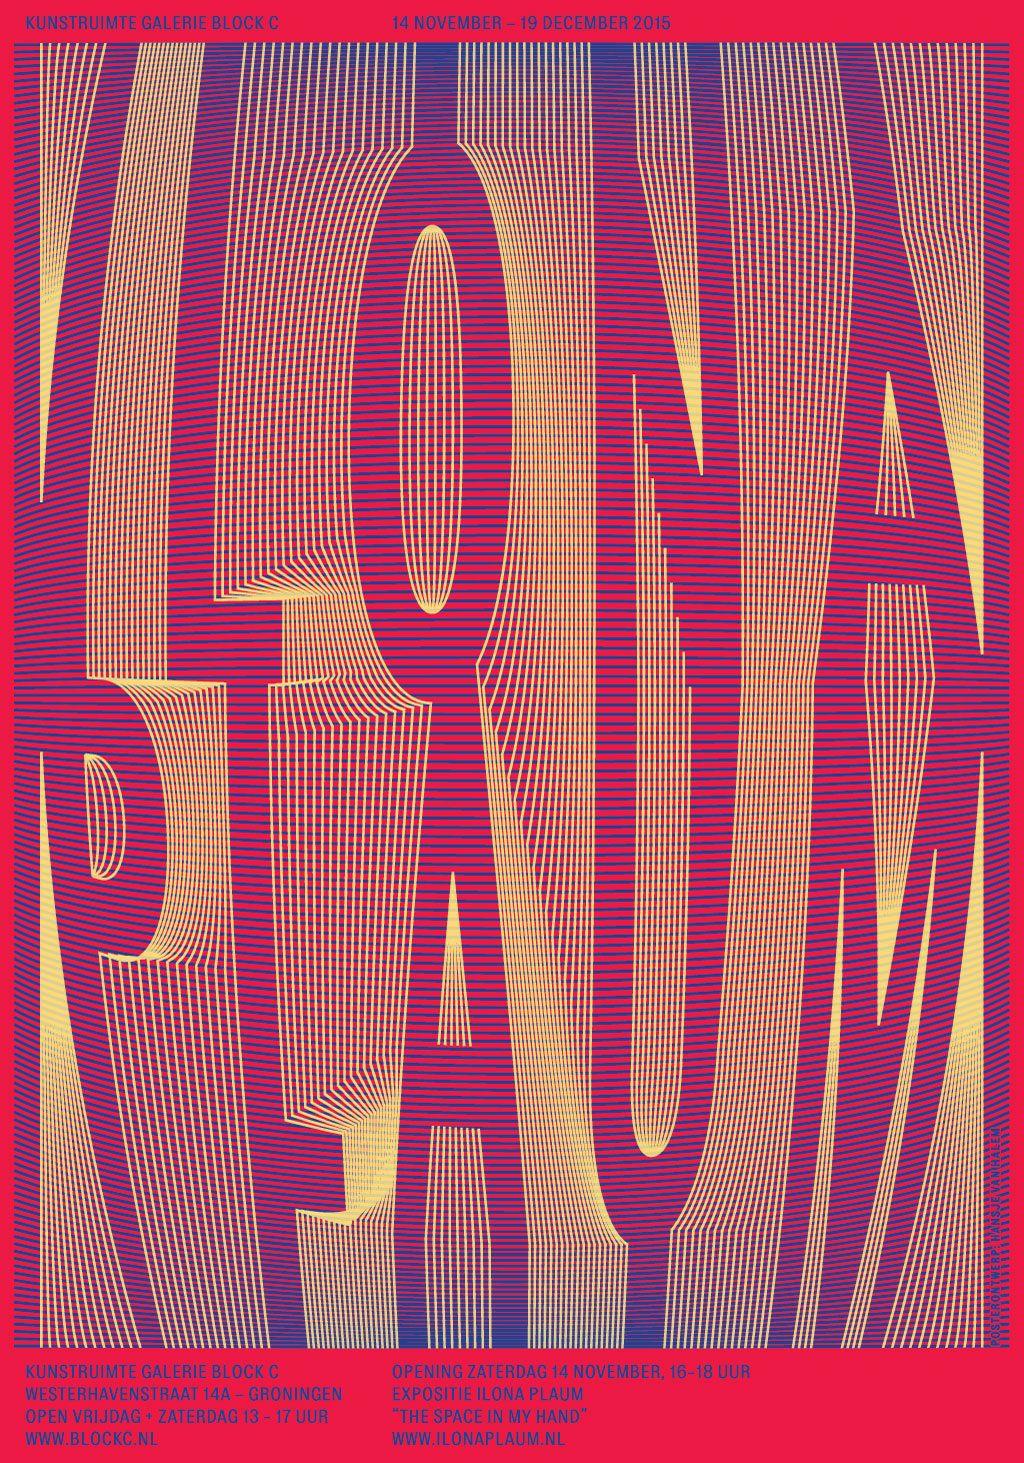 Galerie Block C Poster for Ilona Plaum - www.hansje.net